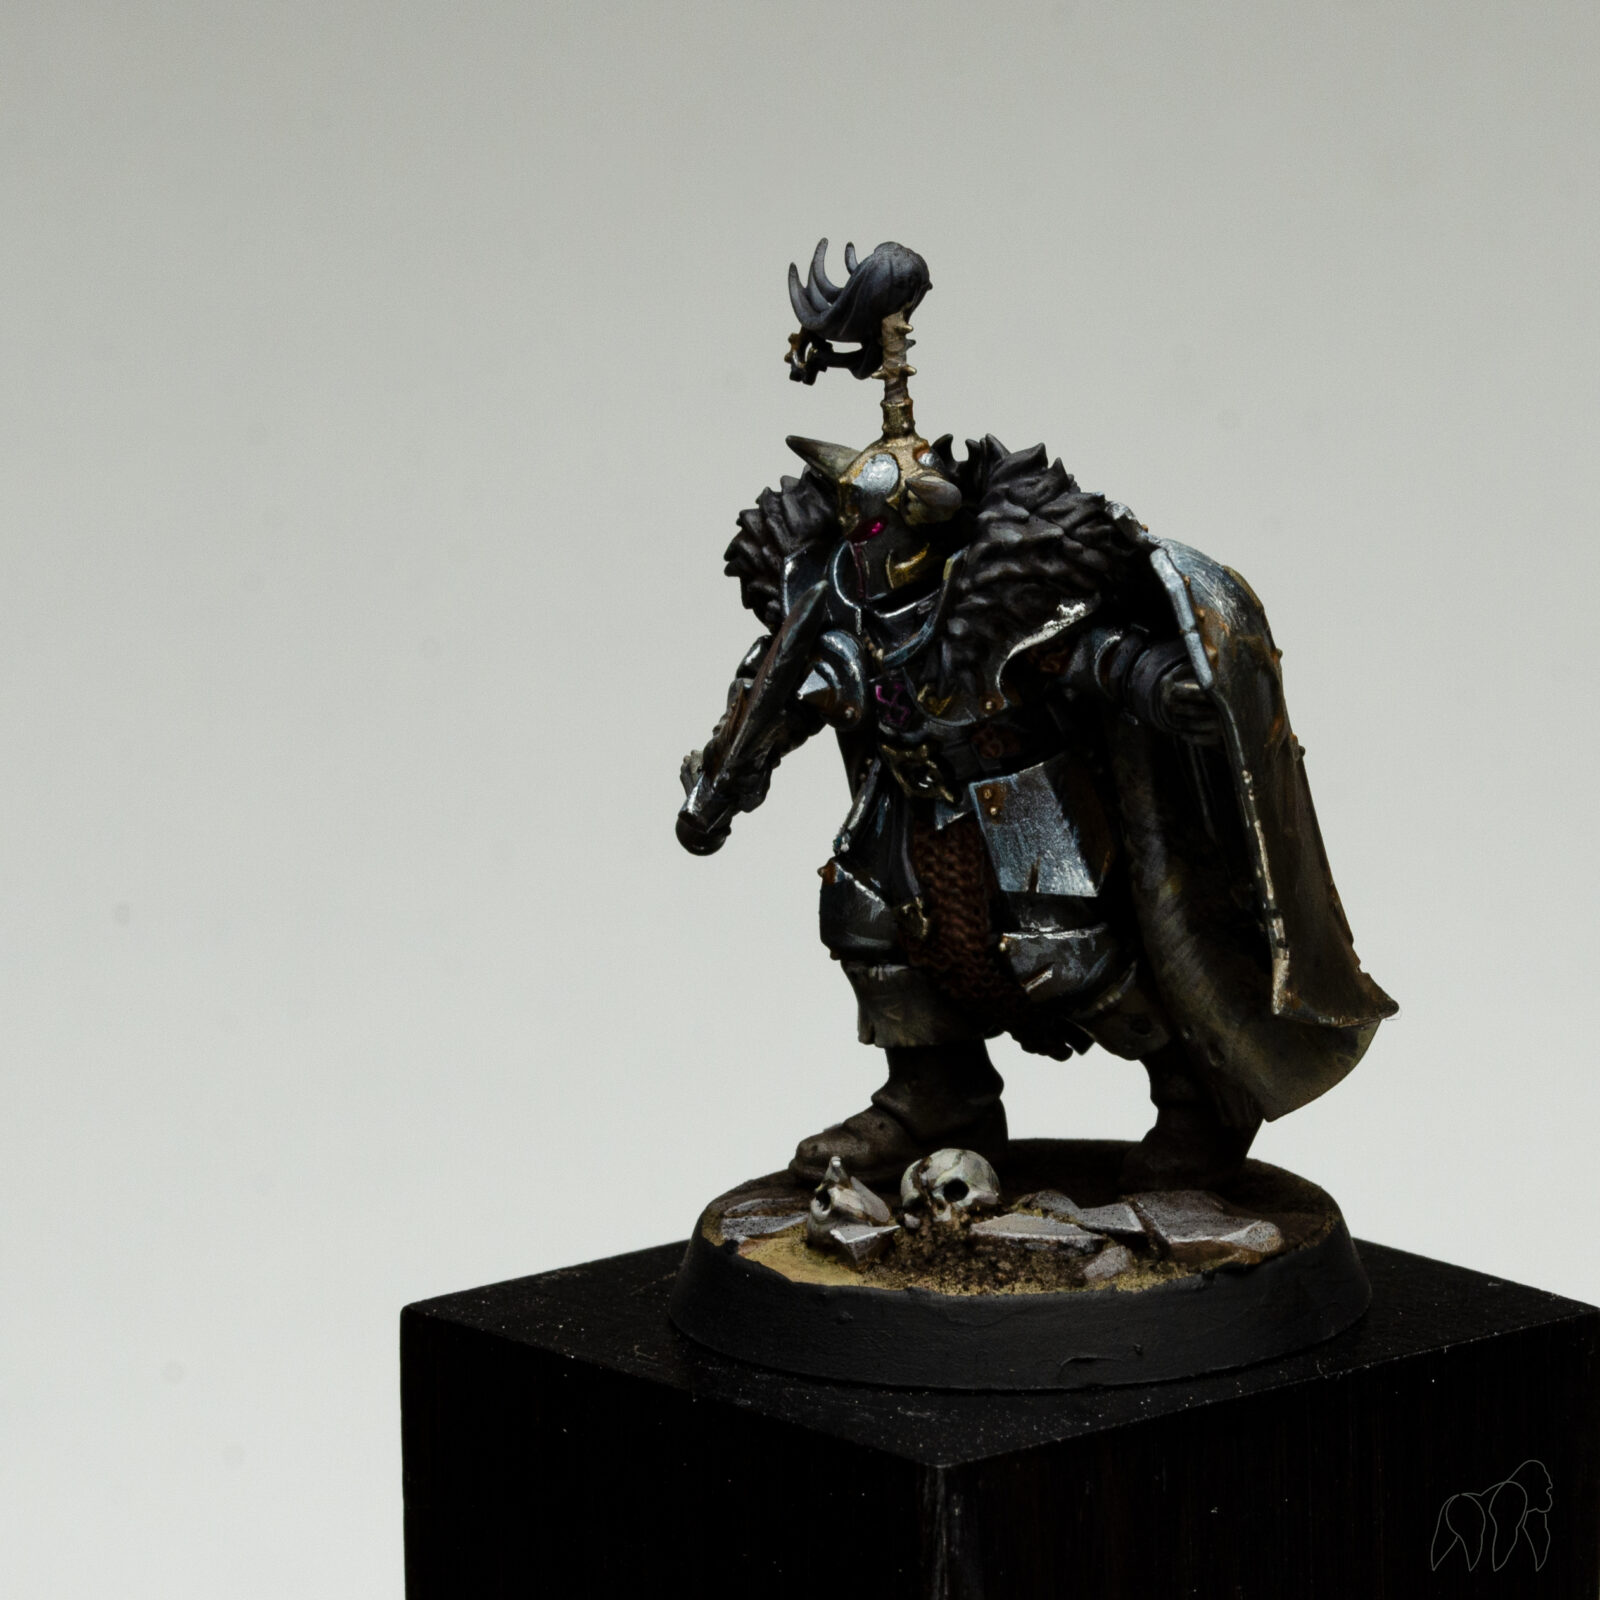 Chaoswarrior11